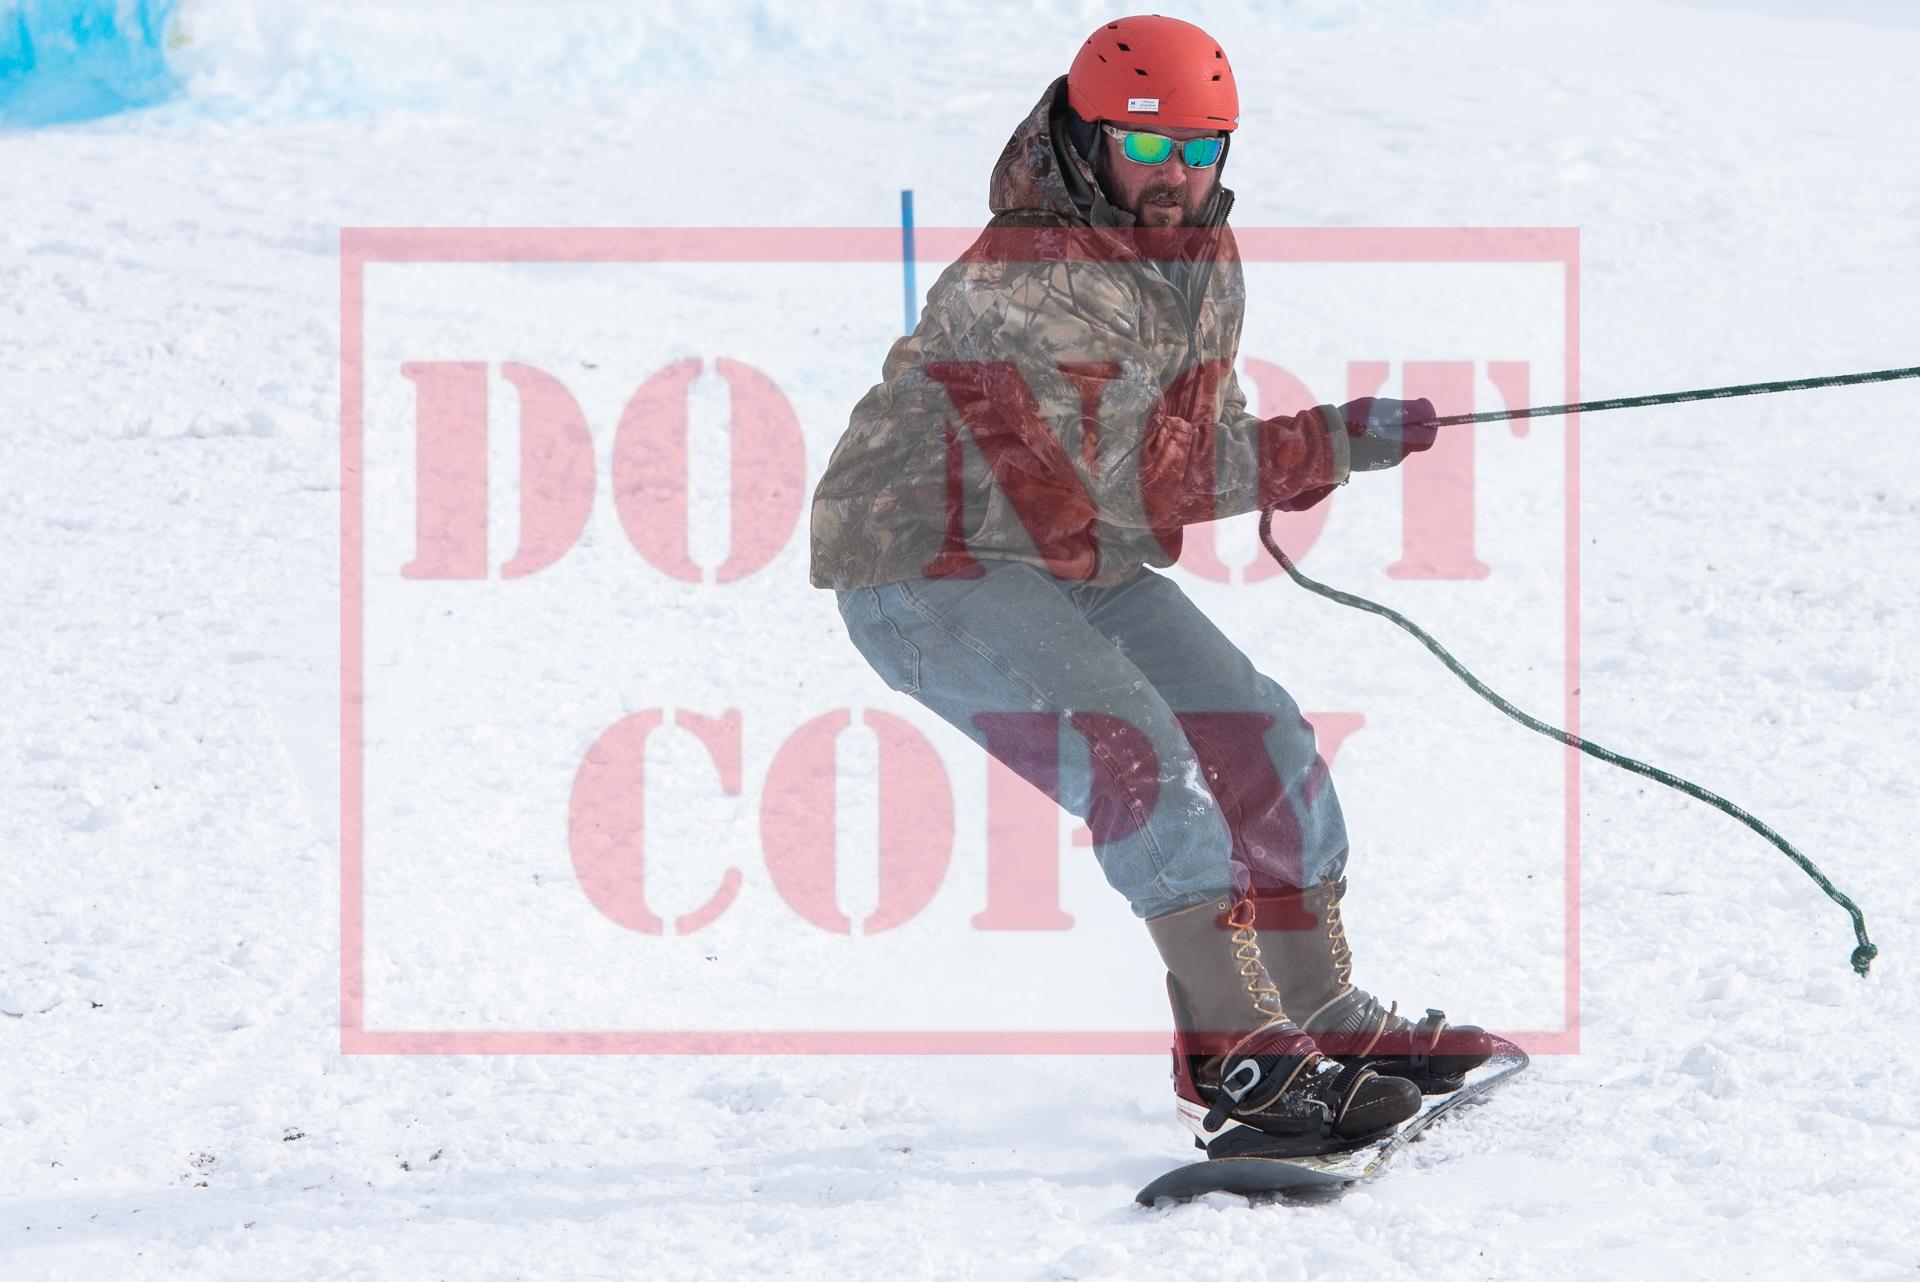 - Rick Farnsworth - Snowboard 4